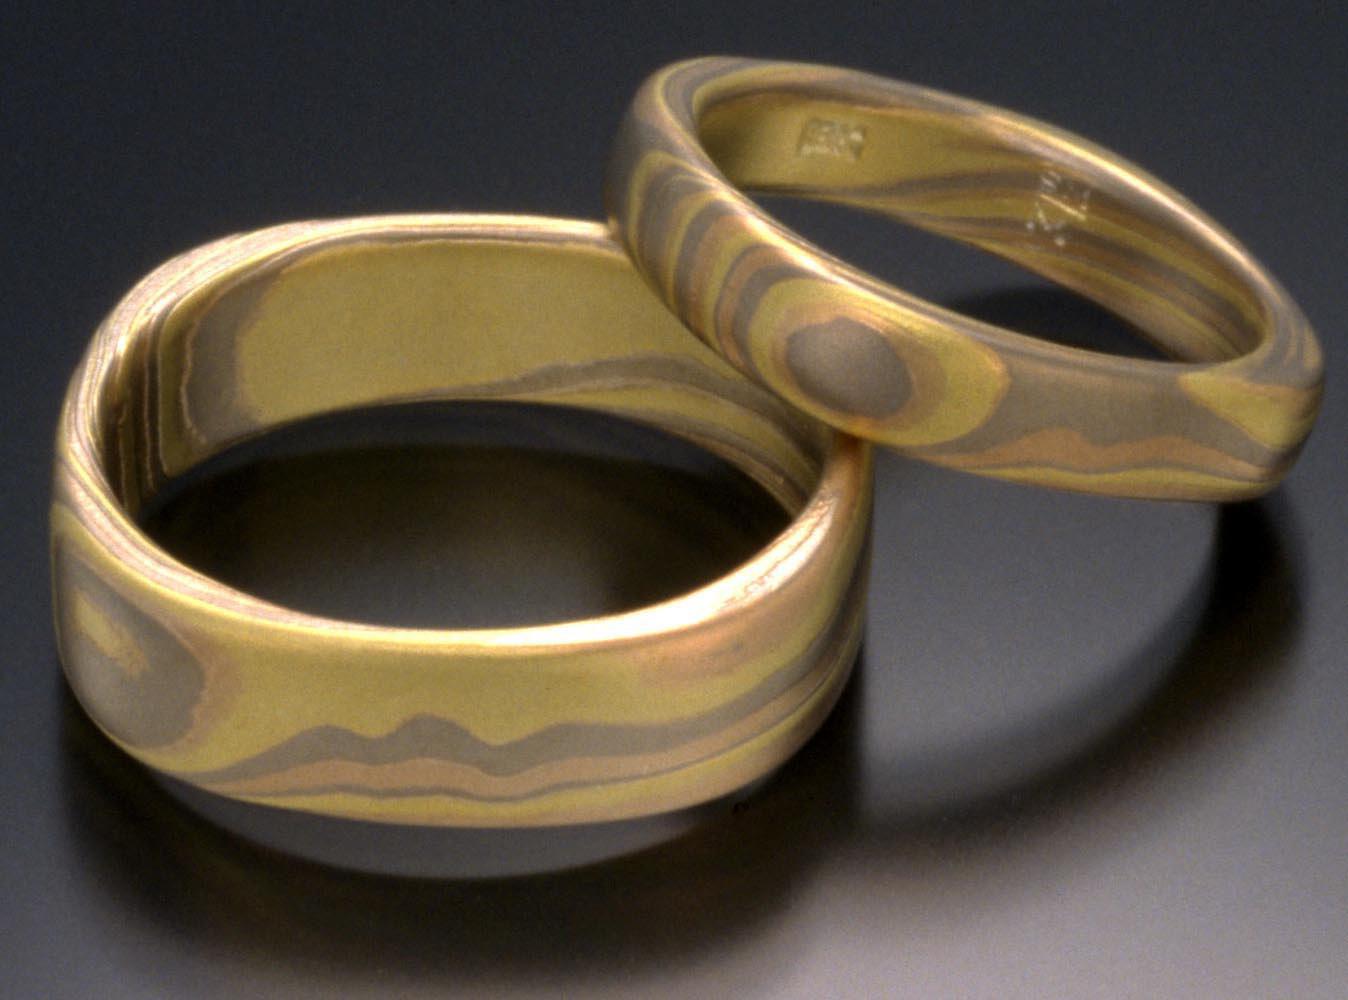 Wedding Bands by Steve Midgett. 18K yellow, white, and red gold. Photo: Ralph Gabriner.